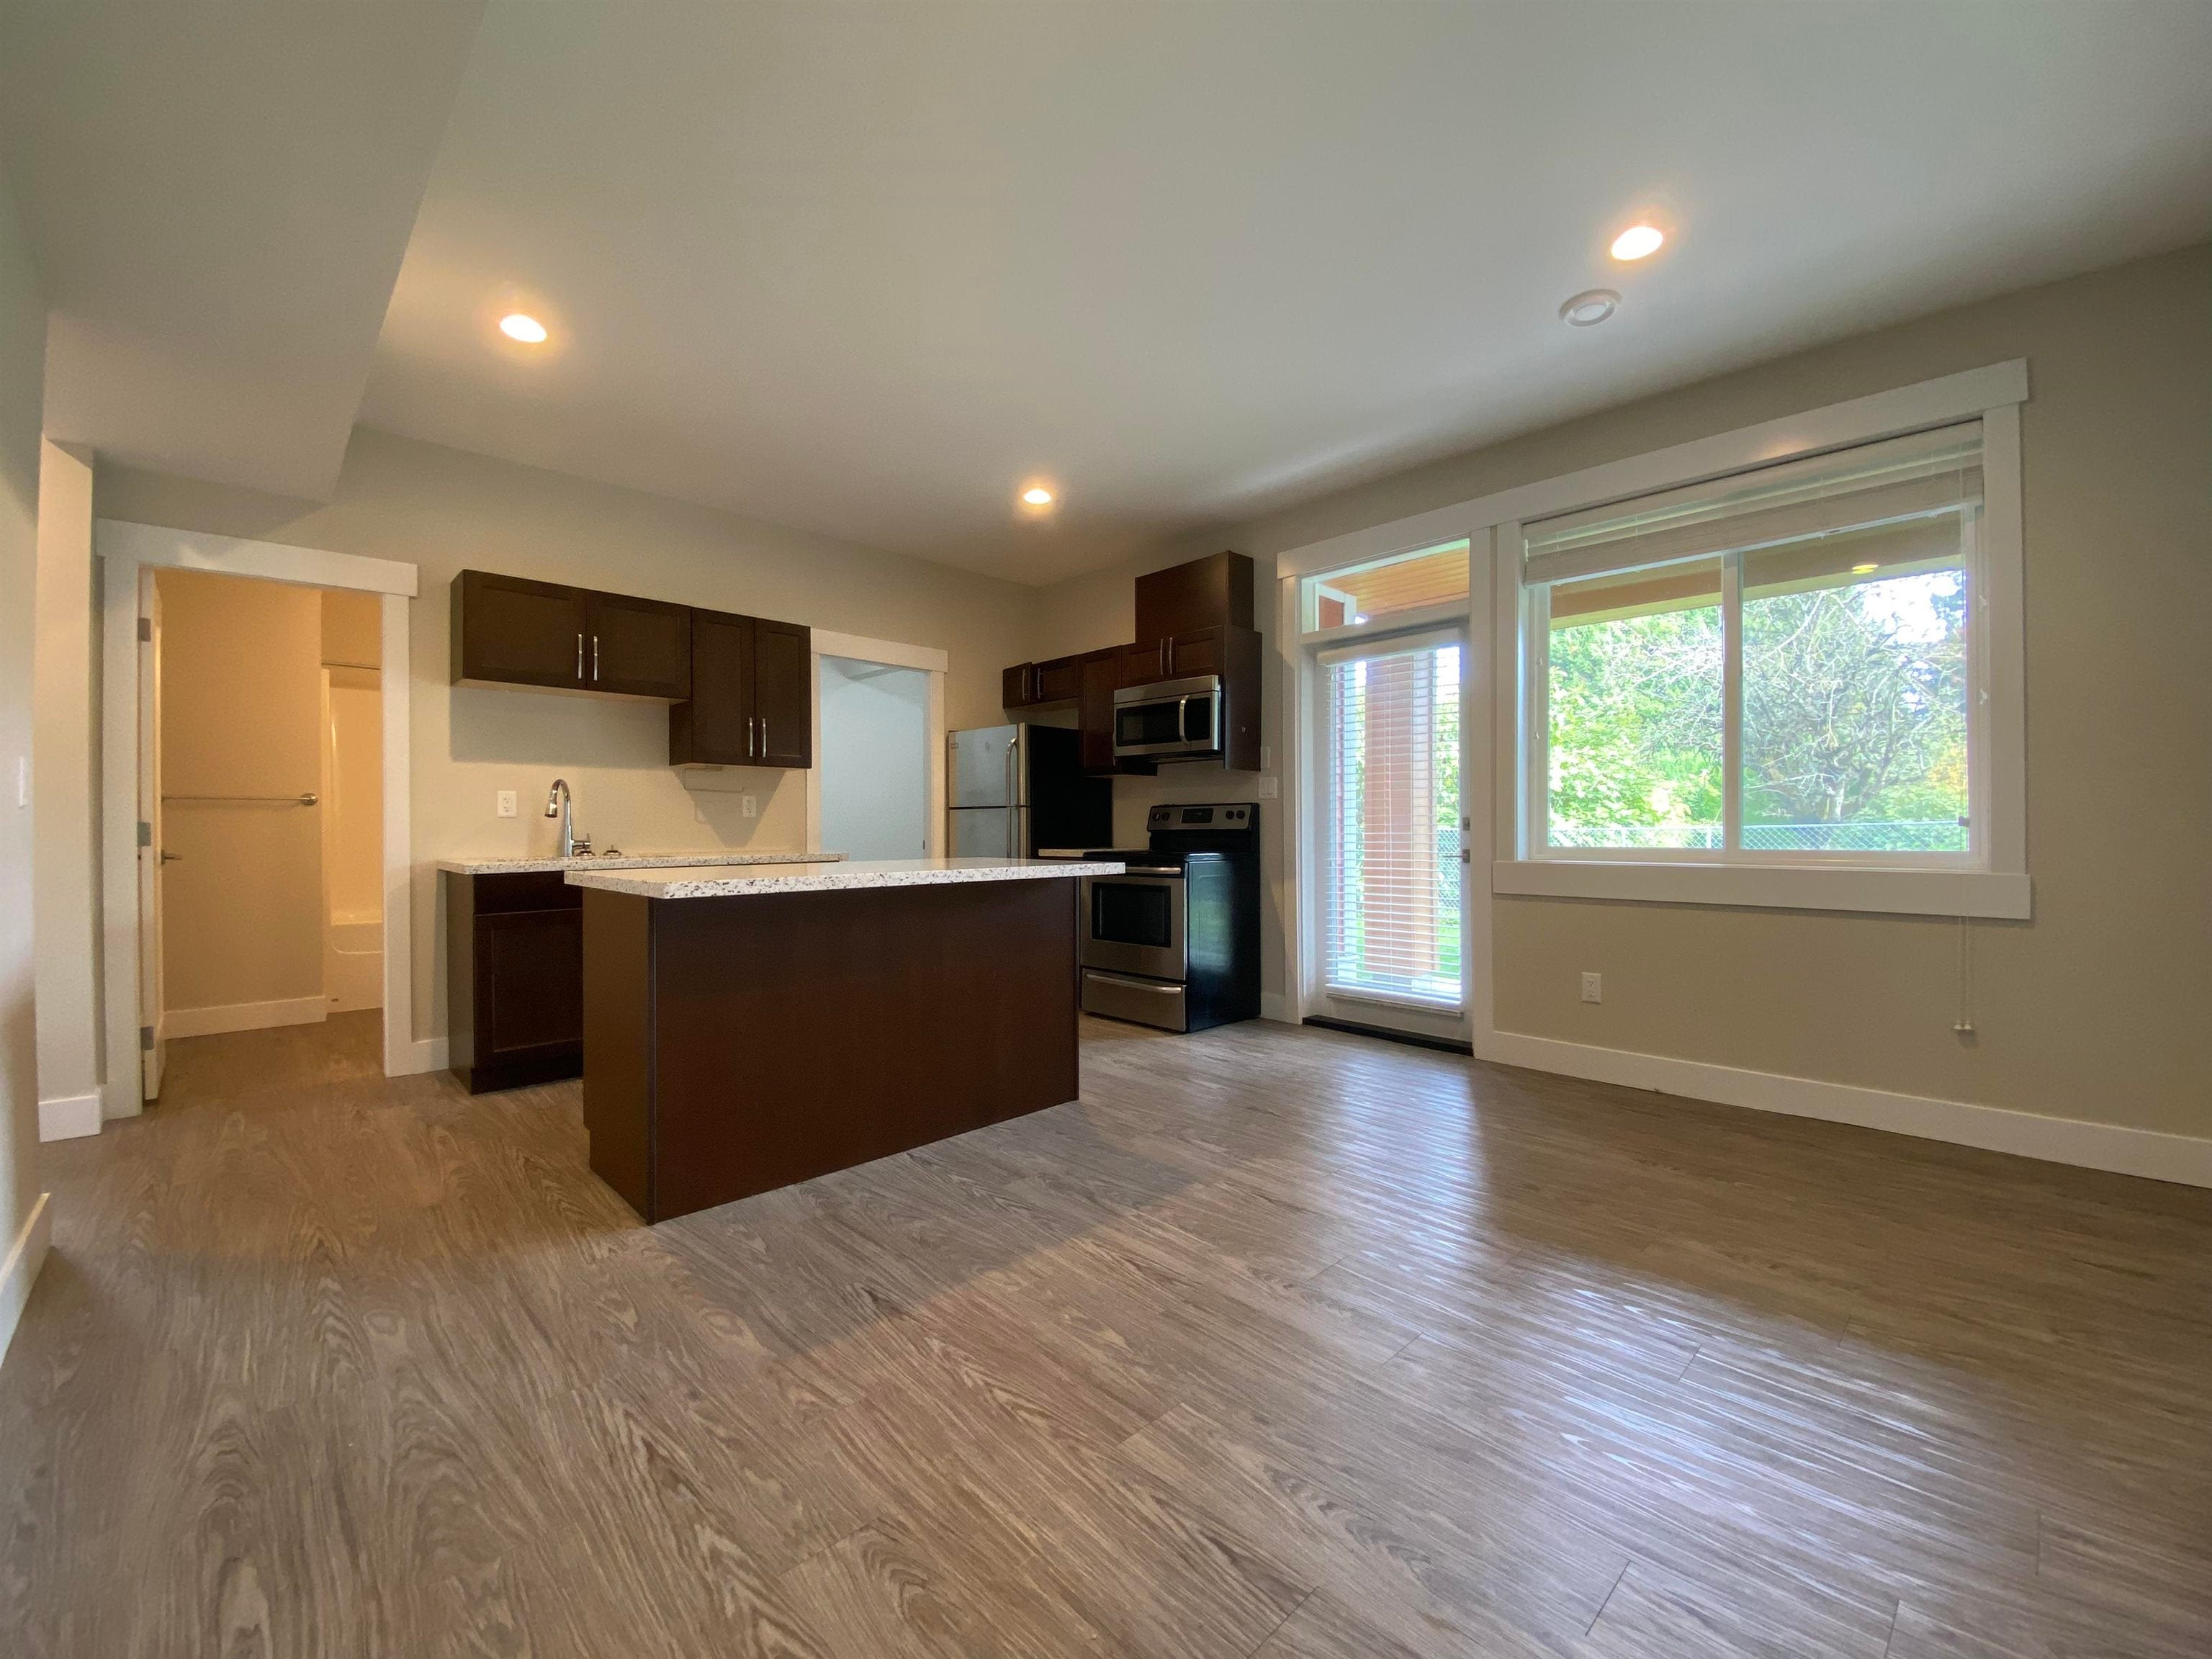 10144 KILLARNEY DRIVE - Fairfield Island House/Single Family for sale, 5 Bedrooms (R2625716) - #33